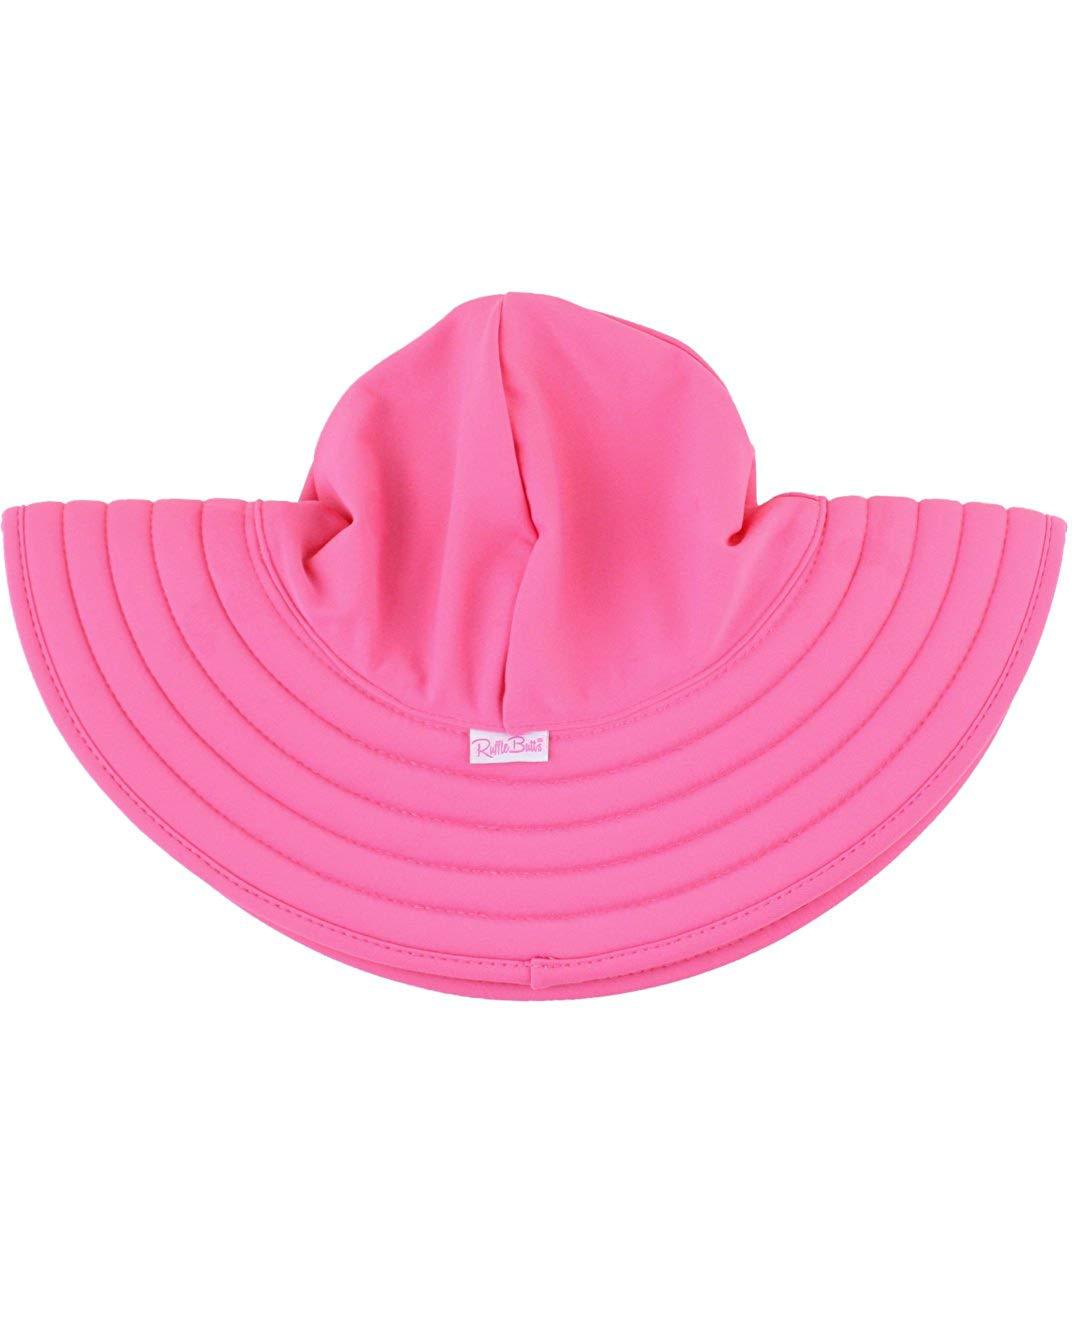 c159c3a52c9 Get Quotations · RuffleButts Baby Toddler Girls Hot Pink Wide Brim Swimwear Sun  Hat w UPF 50